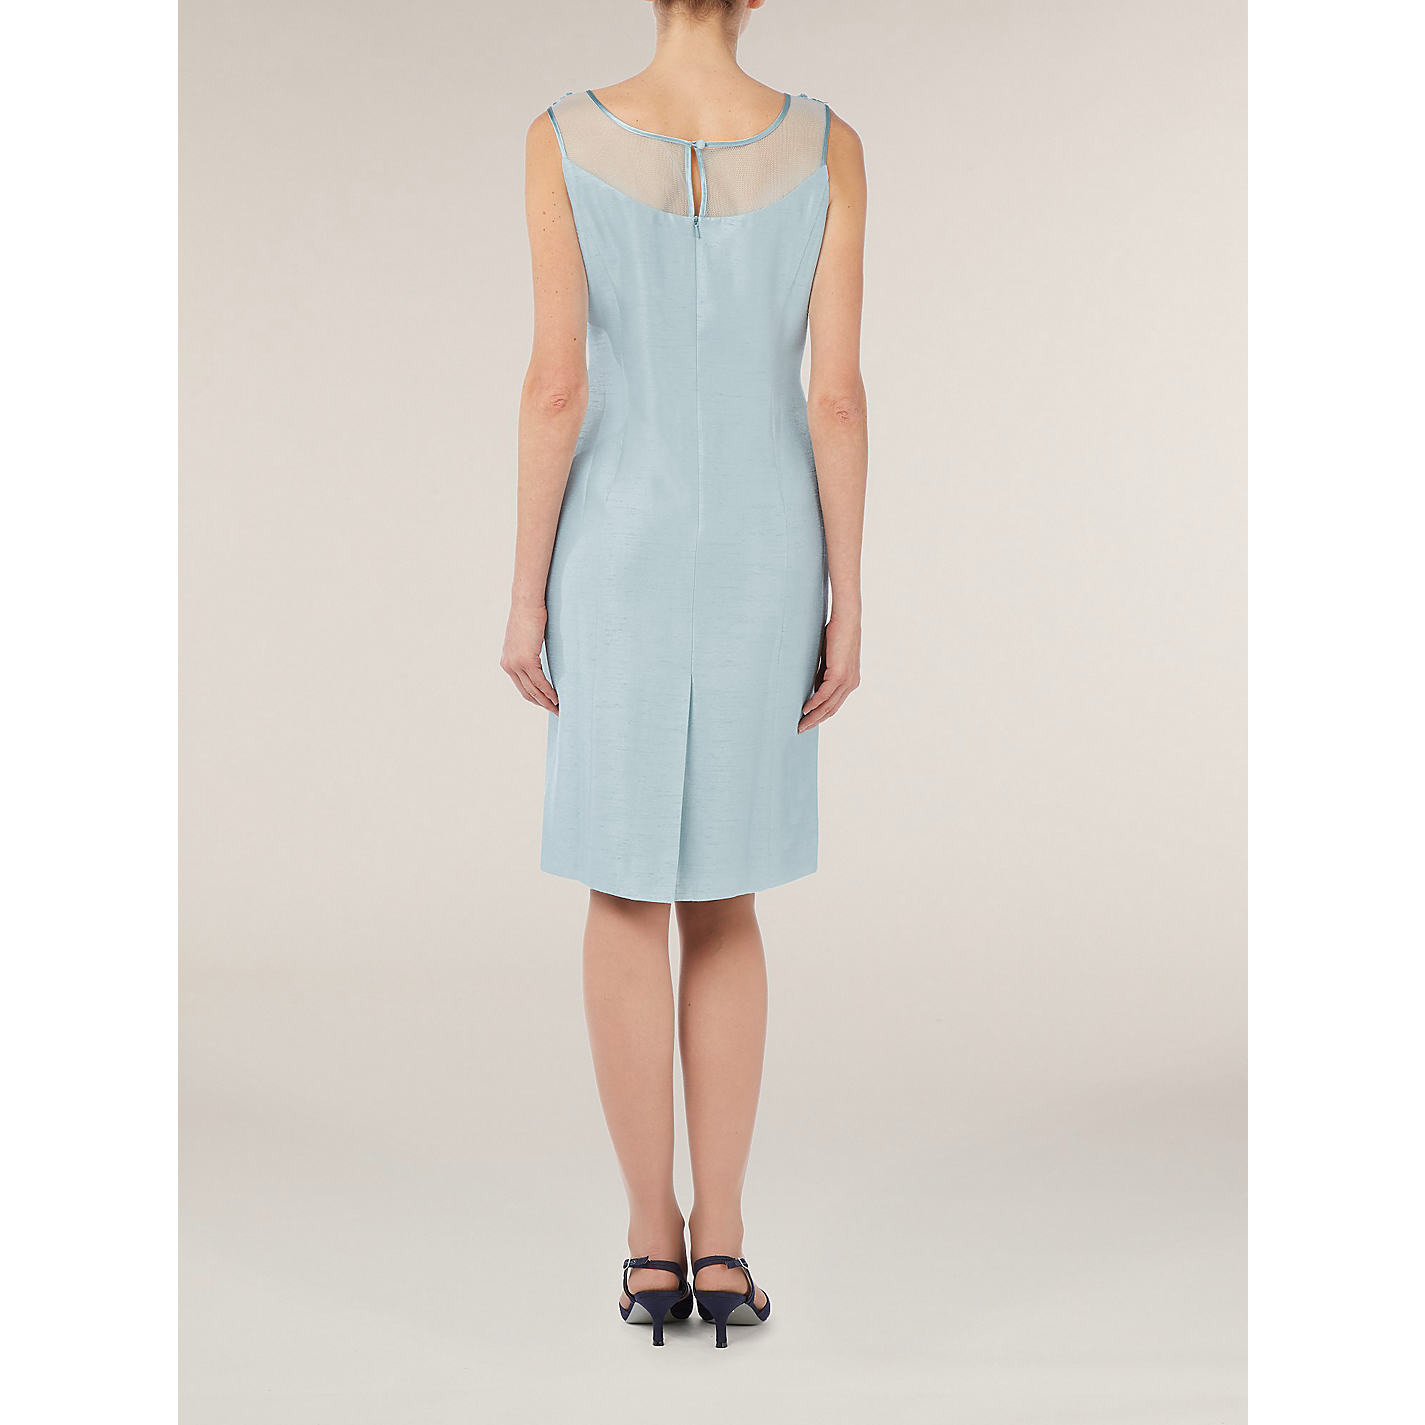 Jacques Vert Dresses for Ladies New Arrivals 2014 - 2015